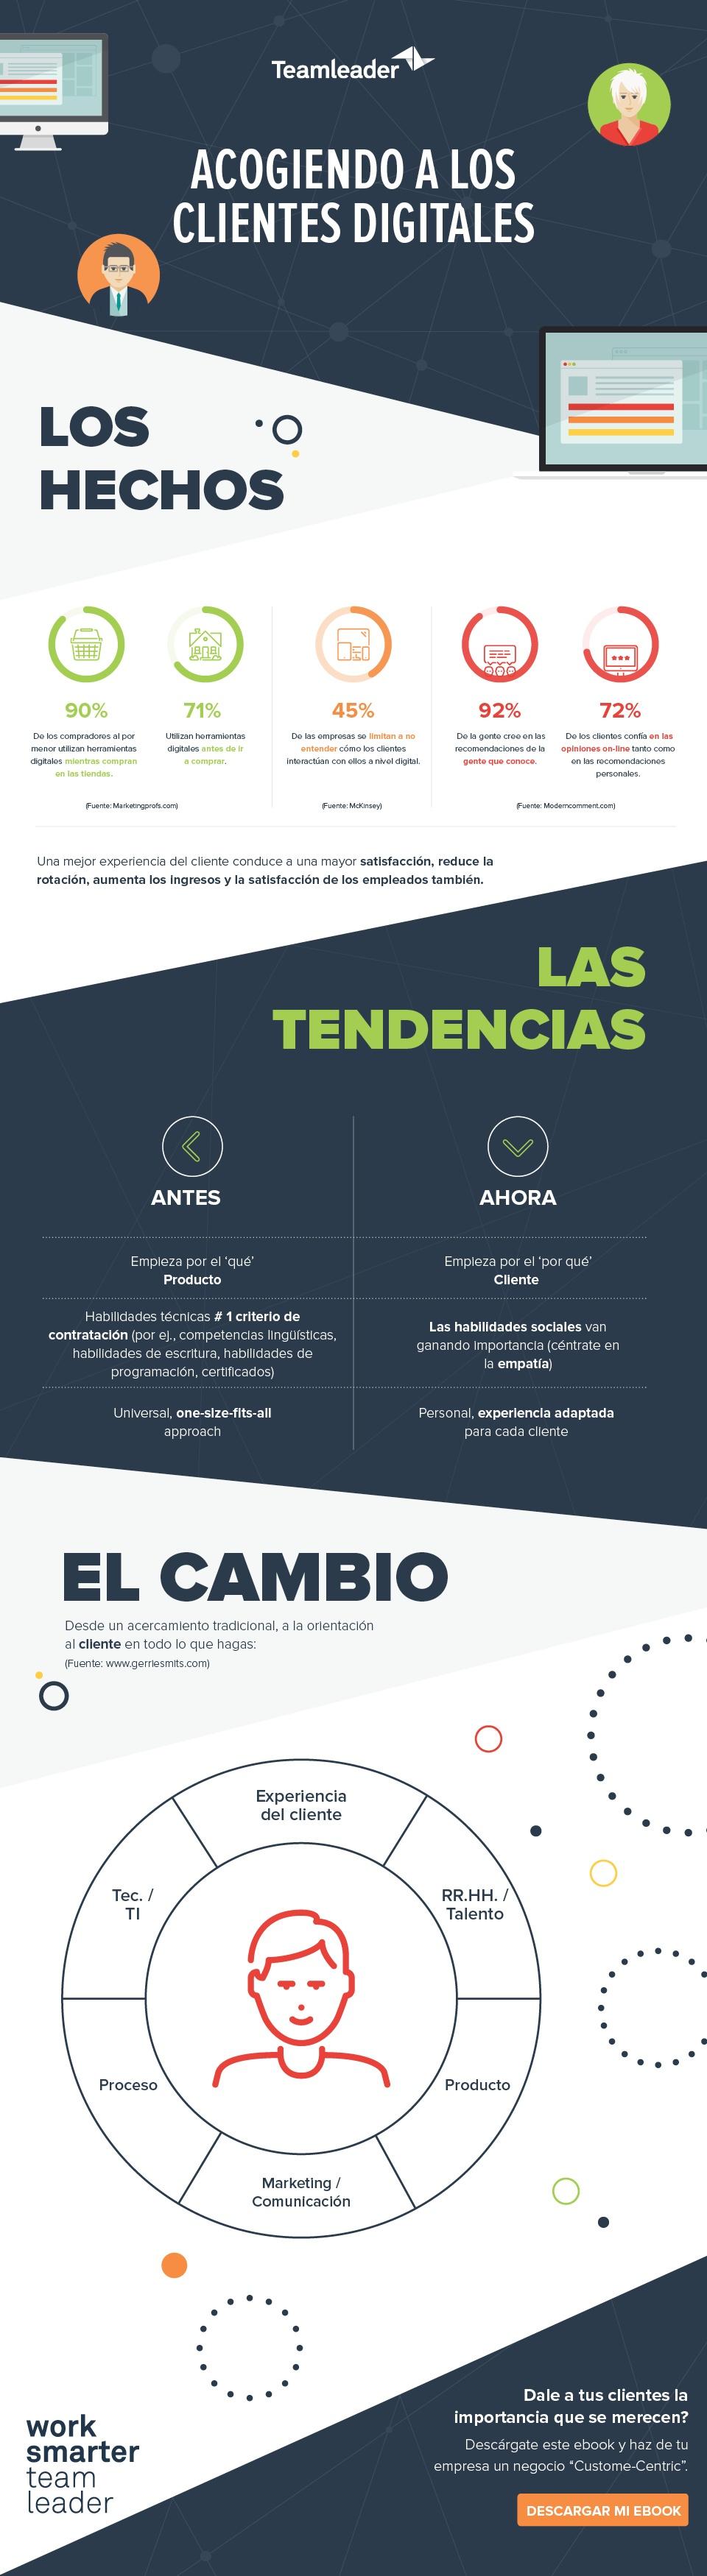 infografia-entender-al-cliente-customer-centric.jpg